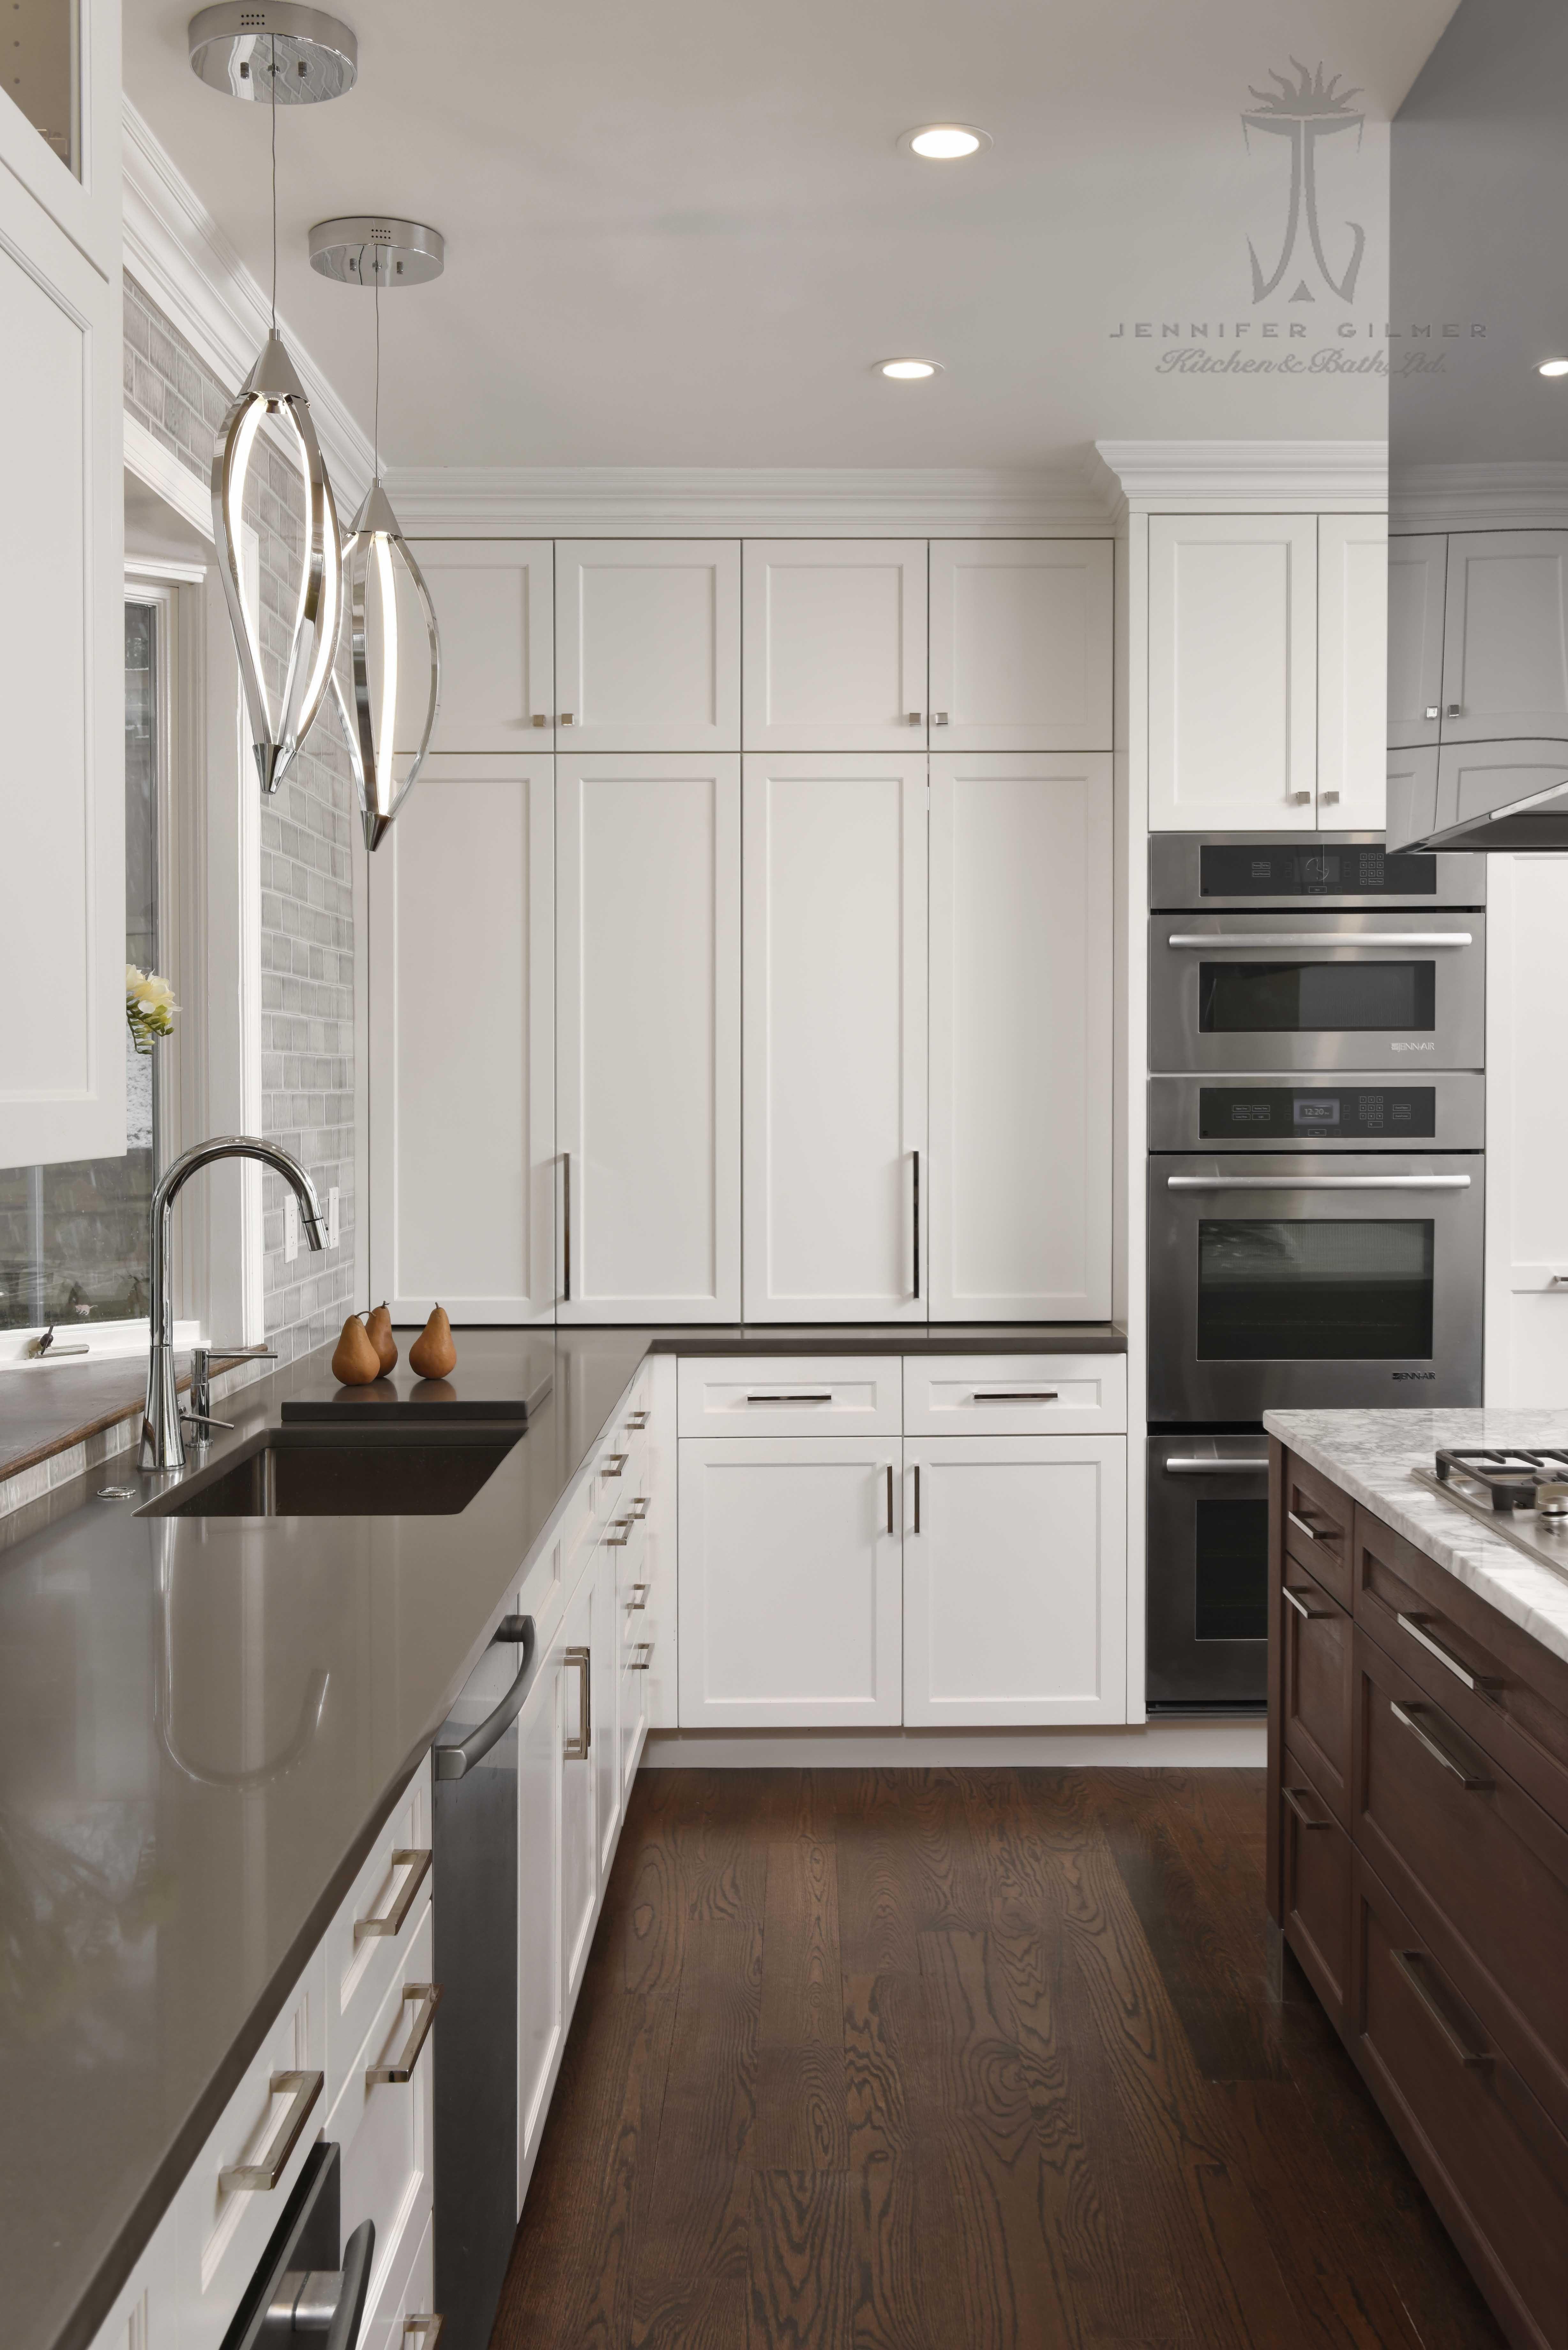 Kitchen Design By #PaulBentham4JenniferGilmer In Bethesda, Maryland  Features Top Knobs M1825 Square Bar Pulls Part 38